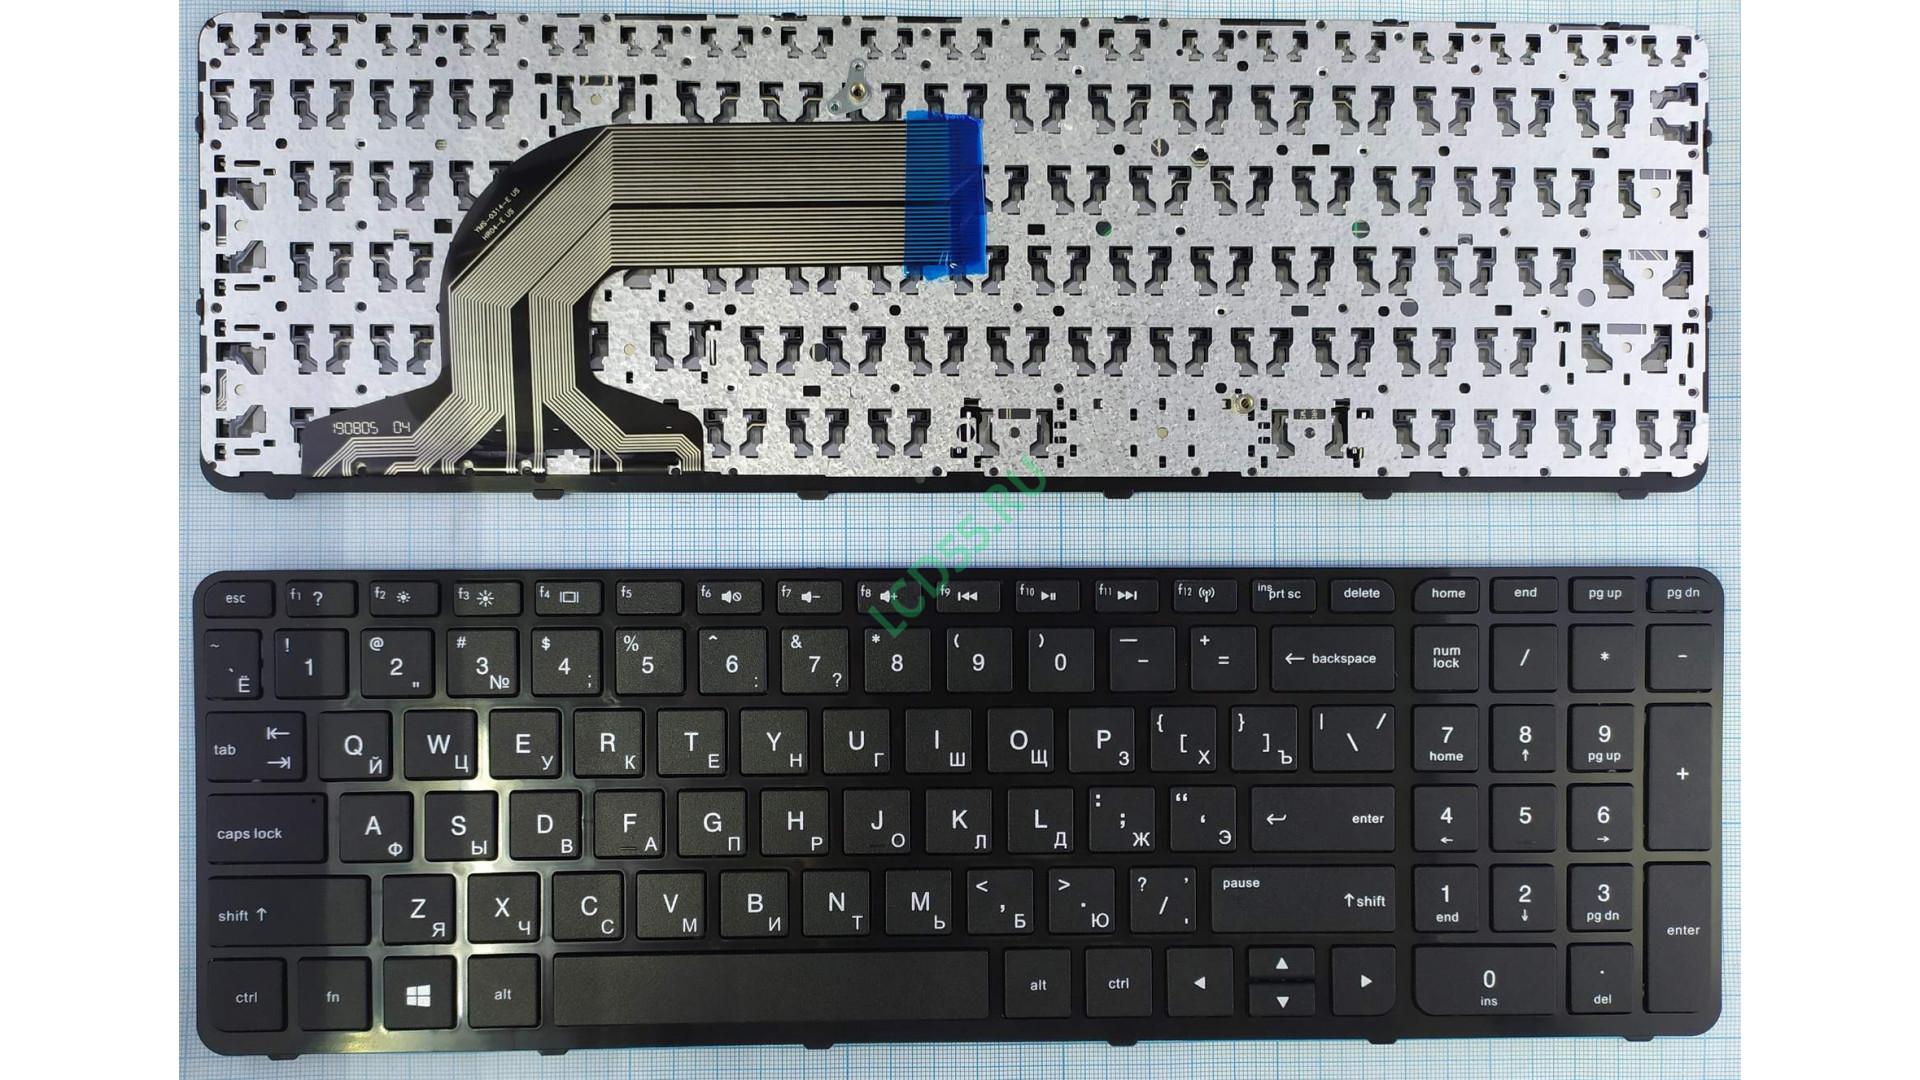 Клавиатура HP Pavilion 15-e, 15-g, 15-n, 15-r, 15-s000, 15t-e, 15t-n, 15z-e, 15z-n, HP 250 G2, 250 G3, 255 G2, 255 G3